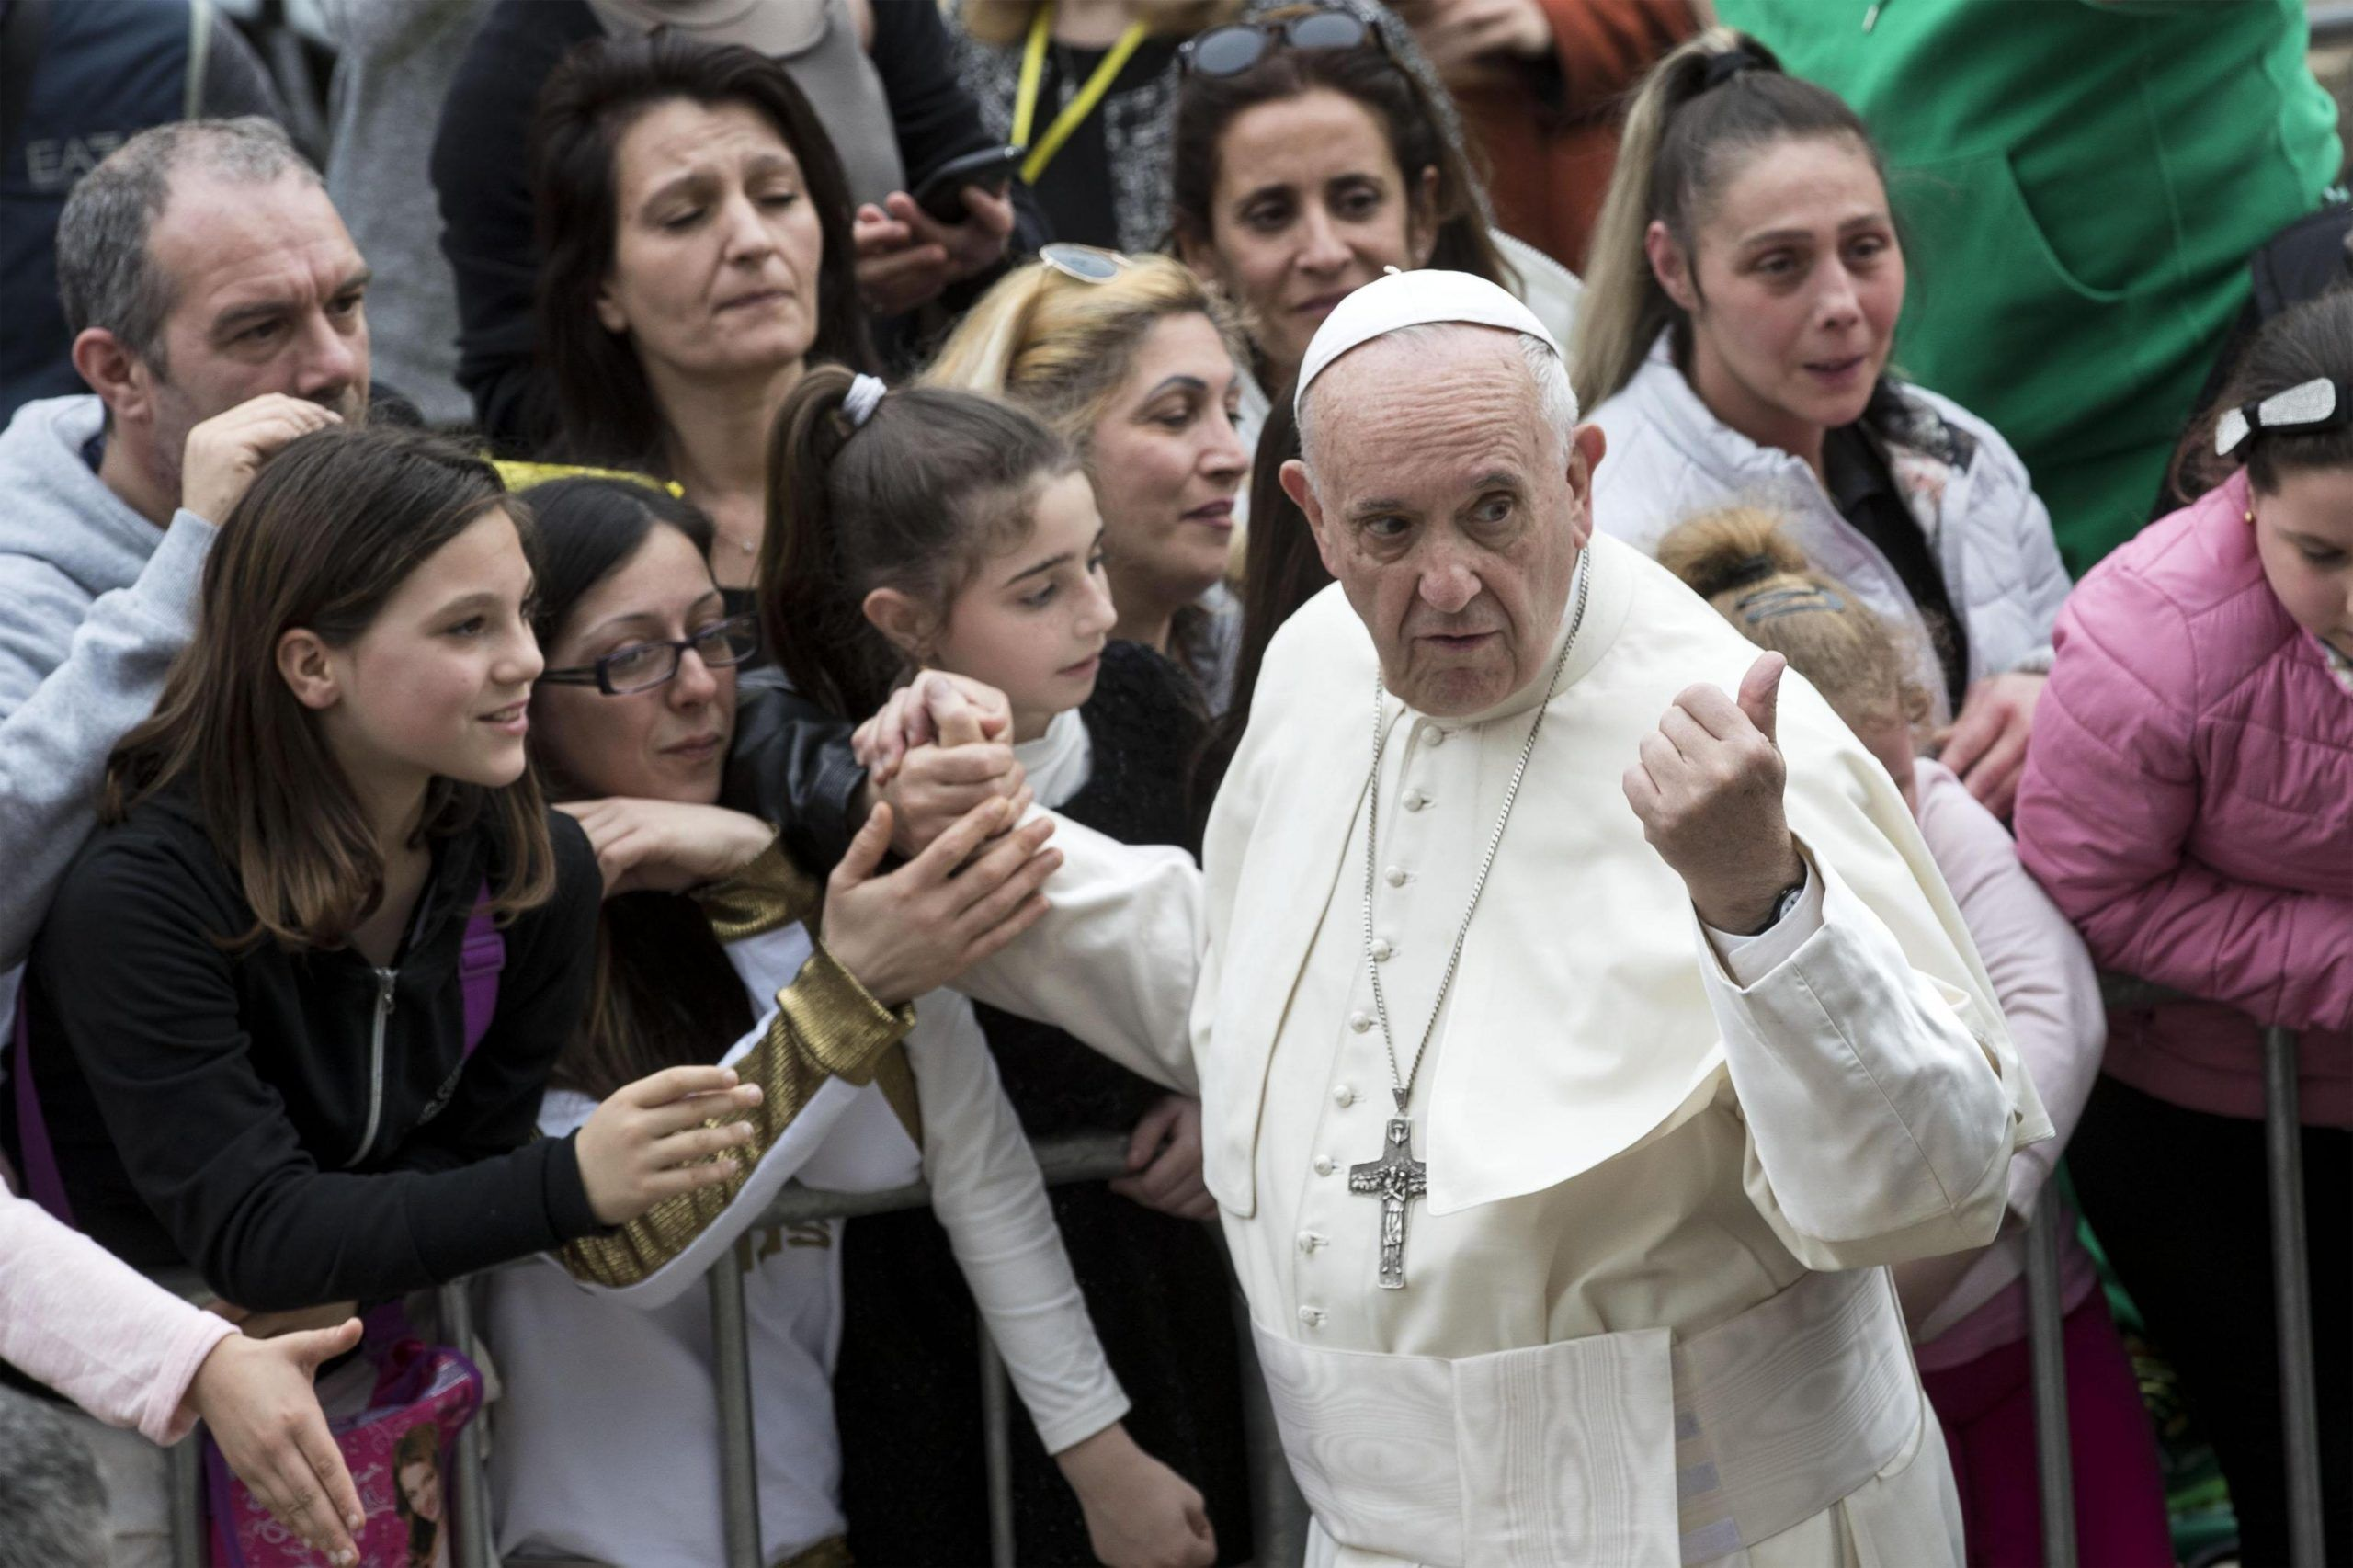 L'abbraccio di Papa Francesco a Emanuele